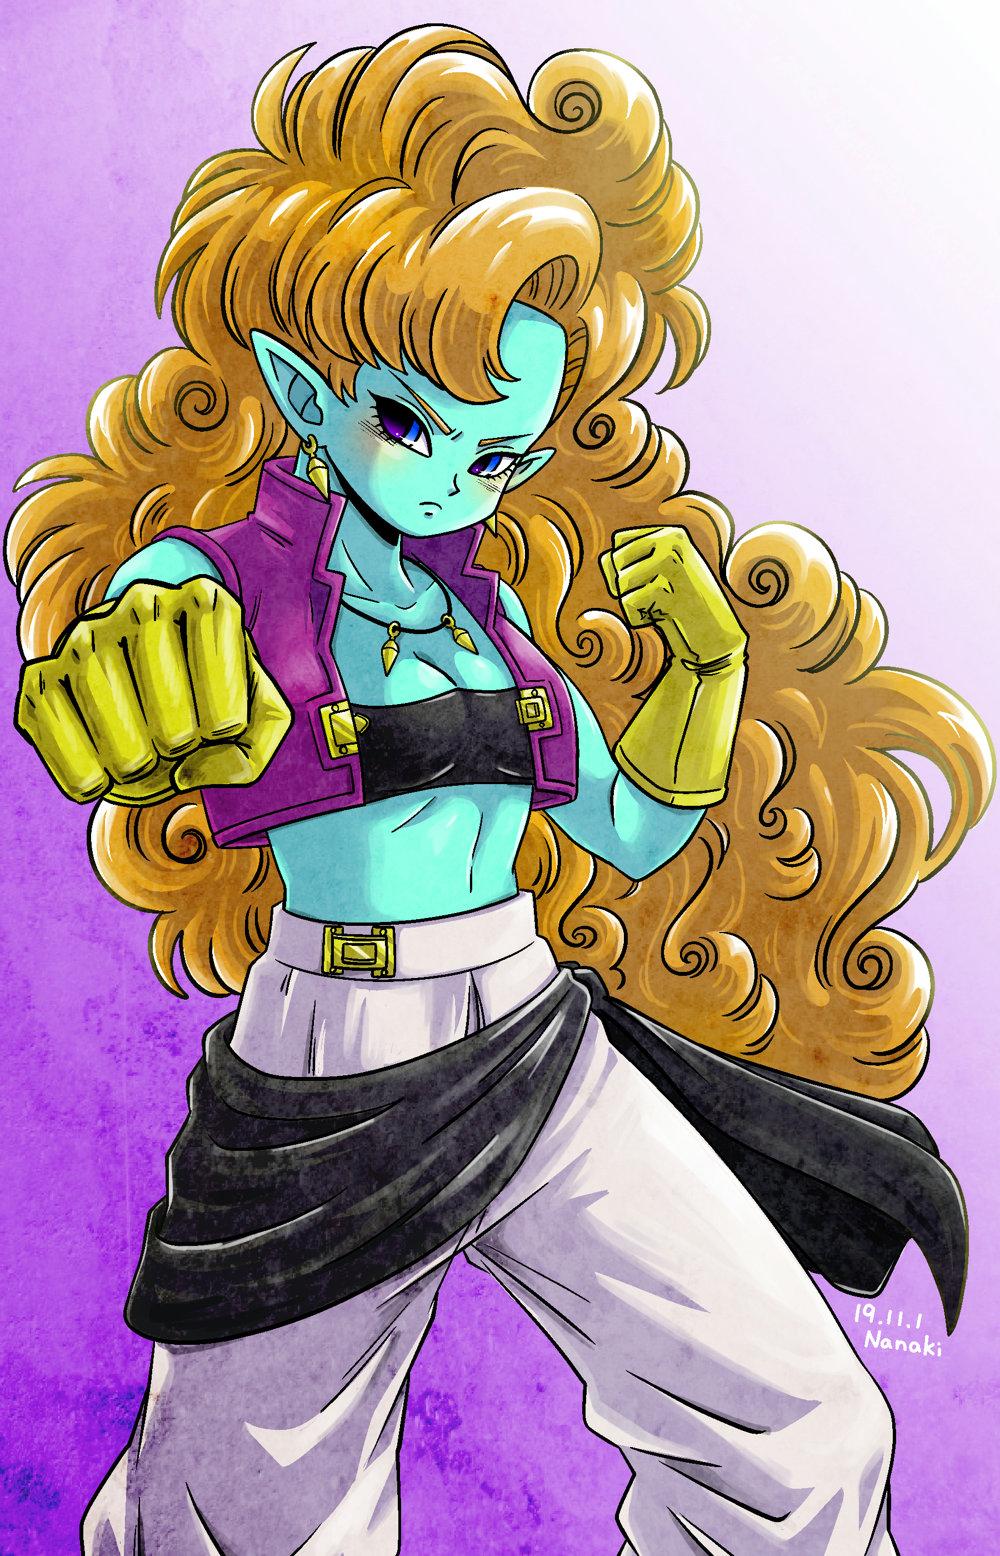 Image - Zangya (DBZ).jpg | Villains Wiki | FANDOM powered